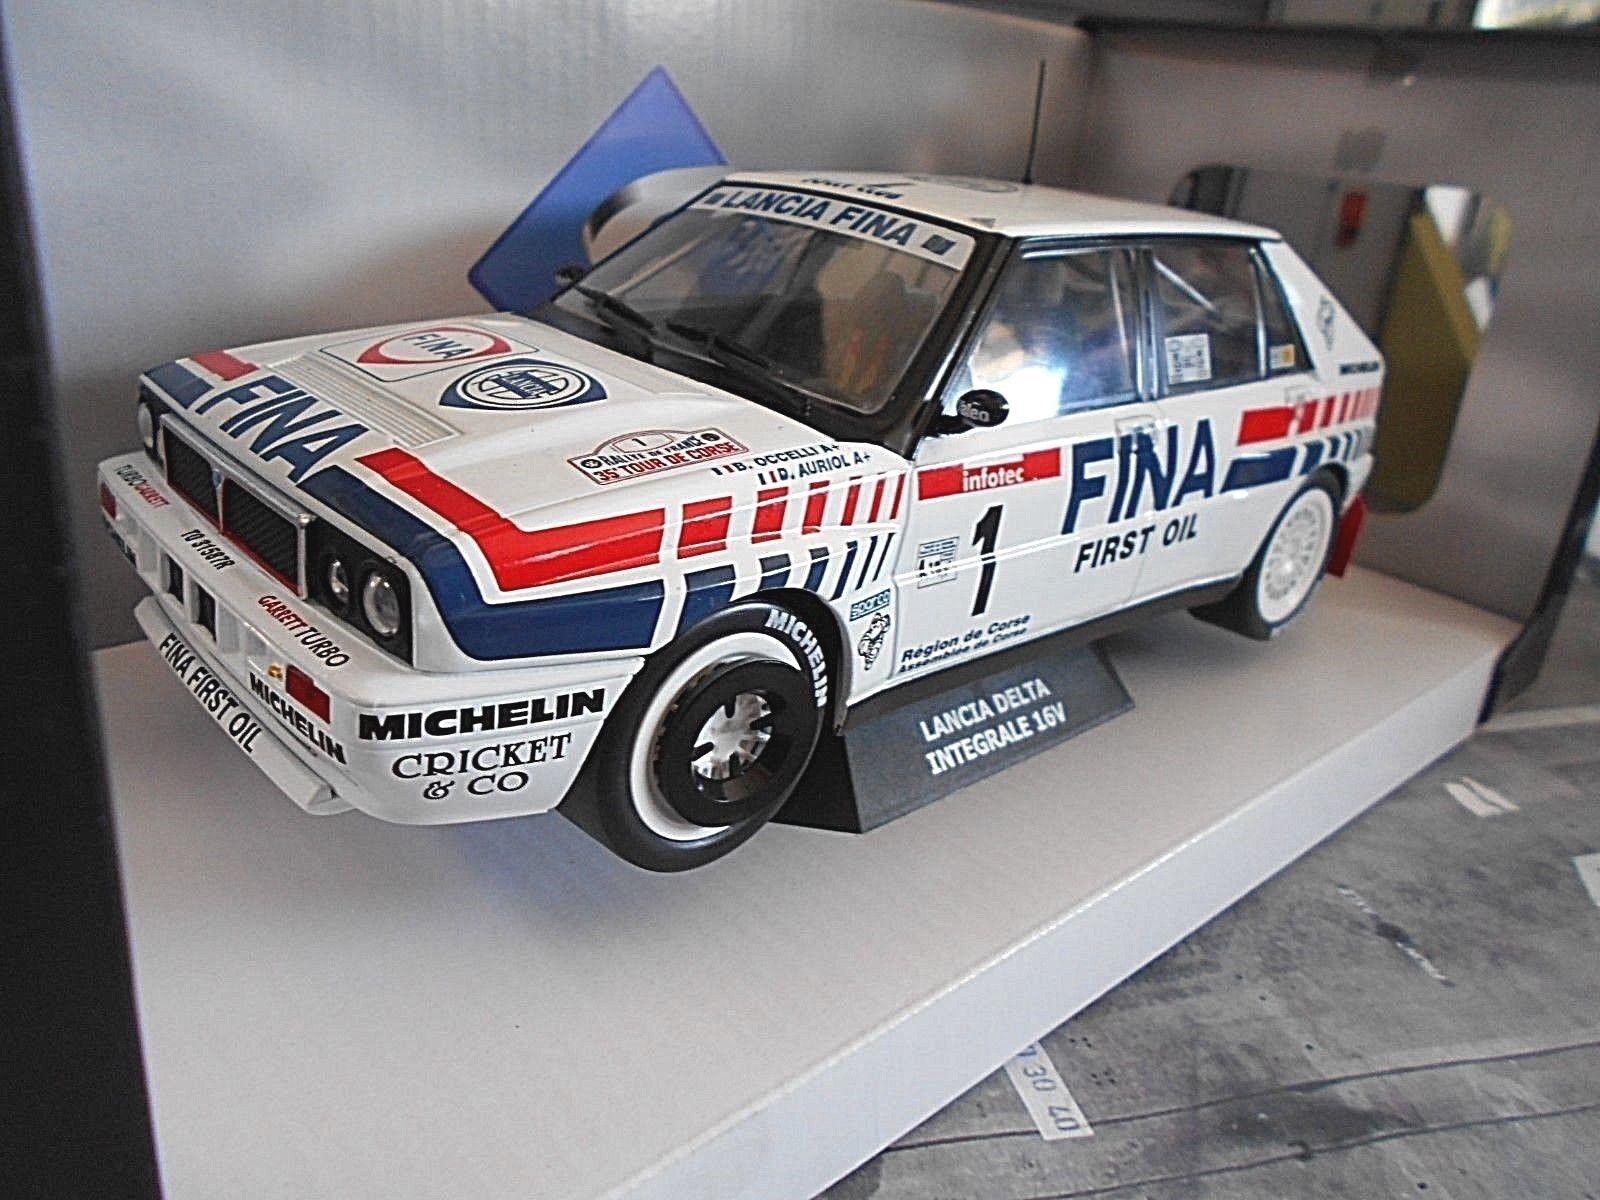 Lancia Delta HF 16v rally intergrale TDC TDC TDC 1991  1 auriol Corse fina solido 1 18 a69dd2